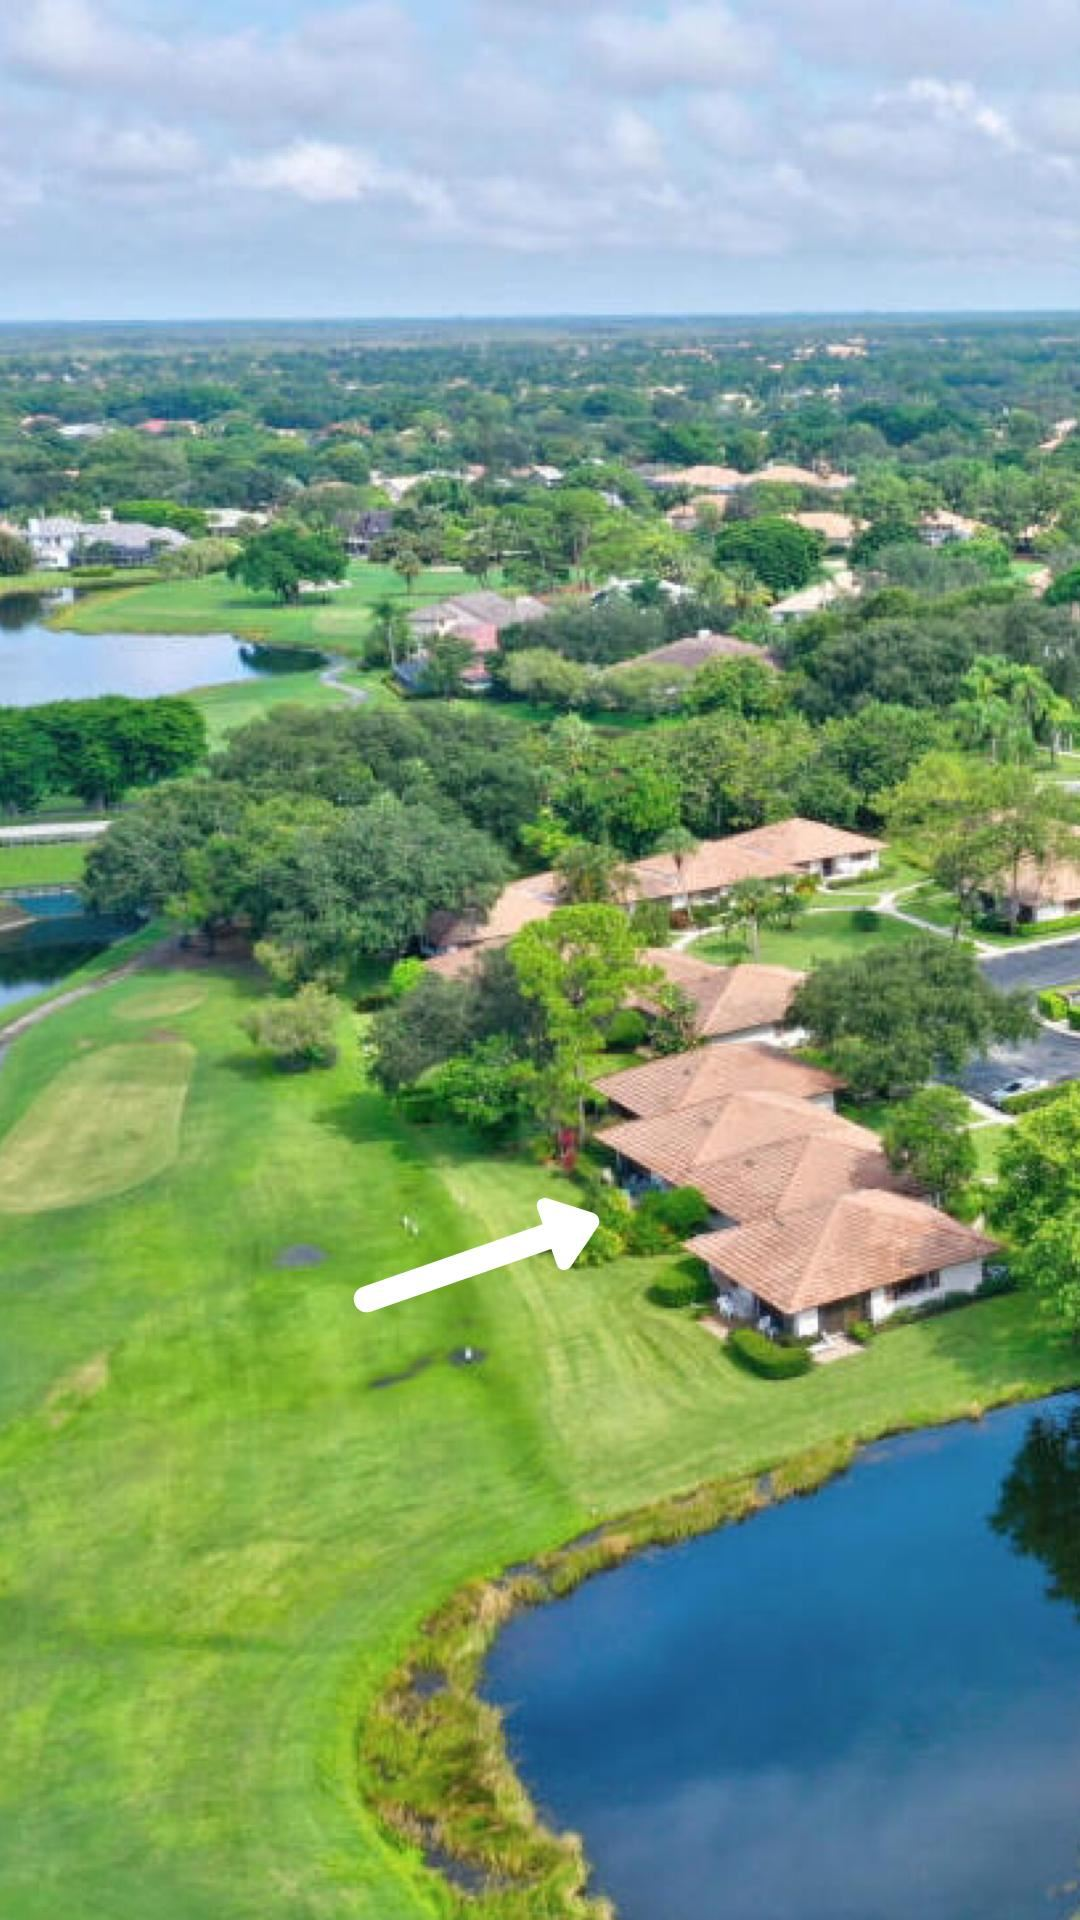 Photo of 817 Club Drive, Palm Beach Gardens, FL 33418 (MLS # RX-10651058)